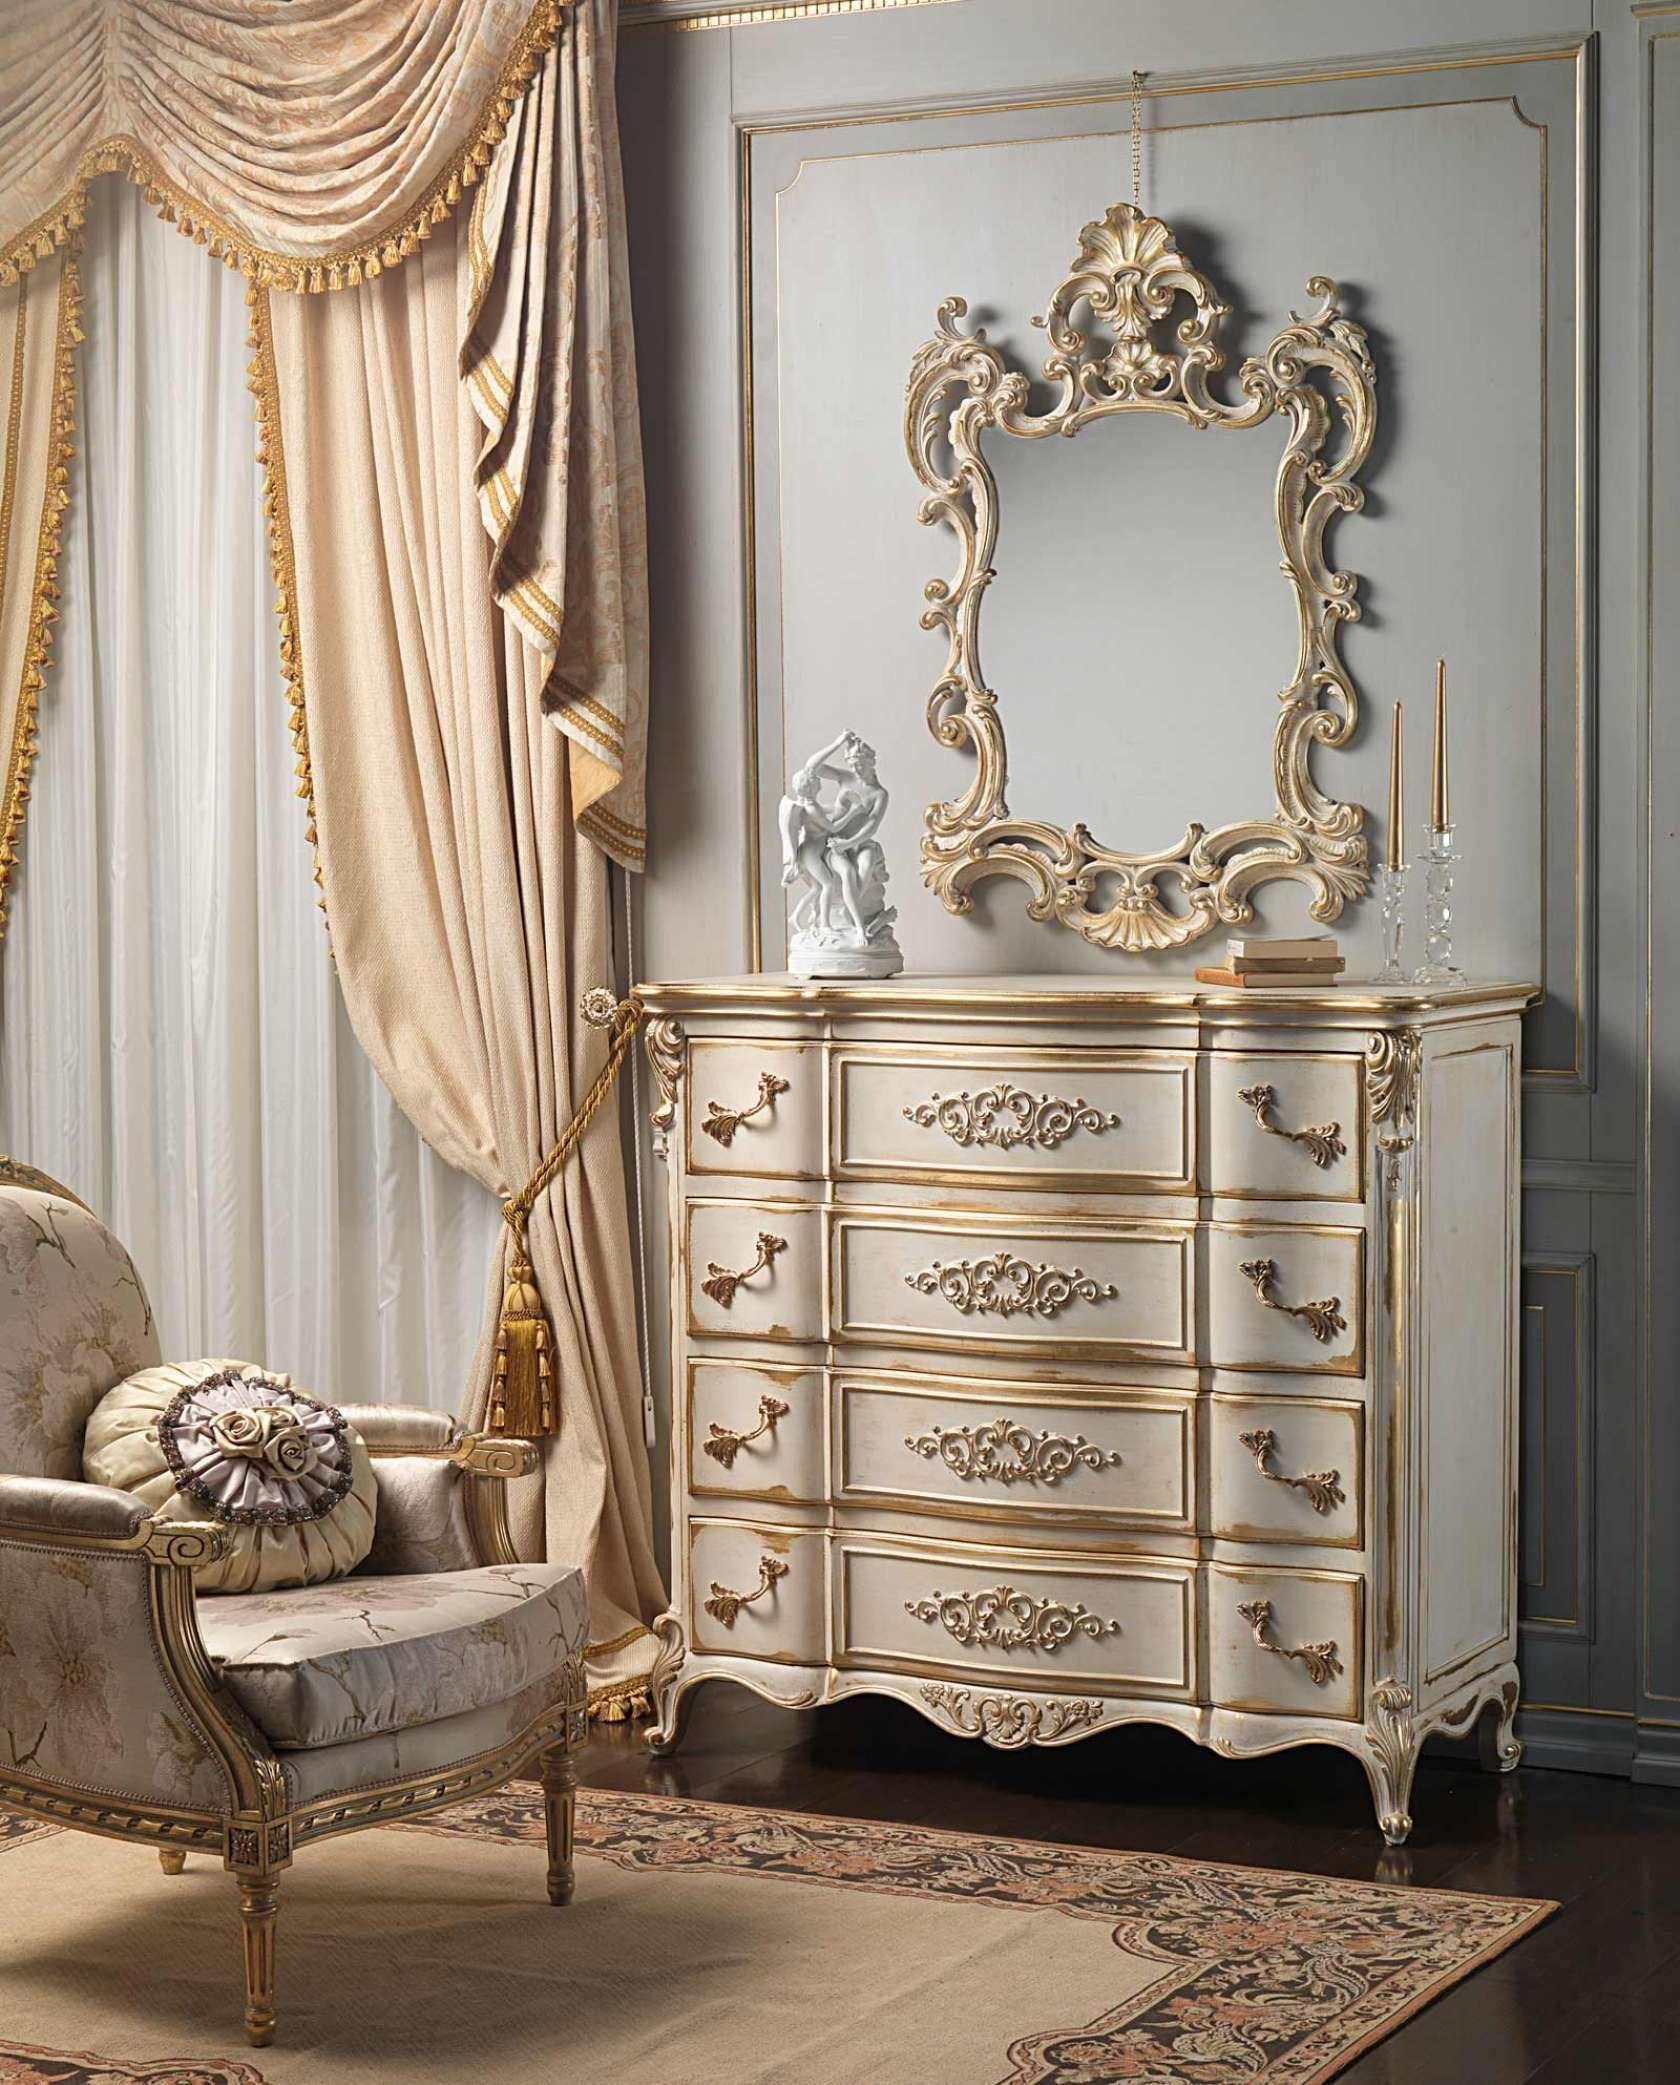 Louis Xvi White And Gold Classic Bedroom - Vimercati Classic